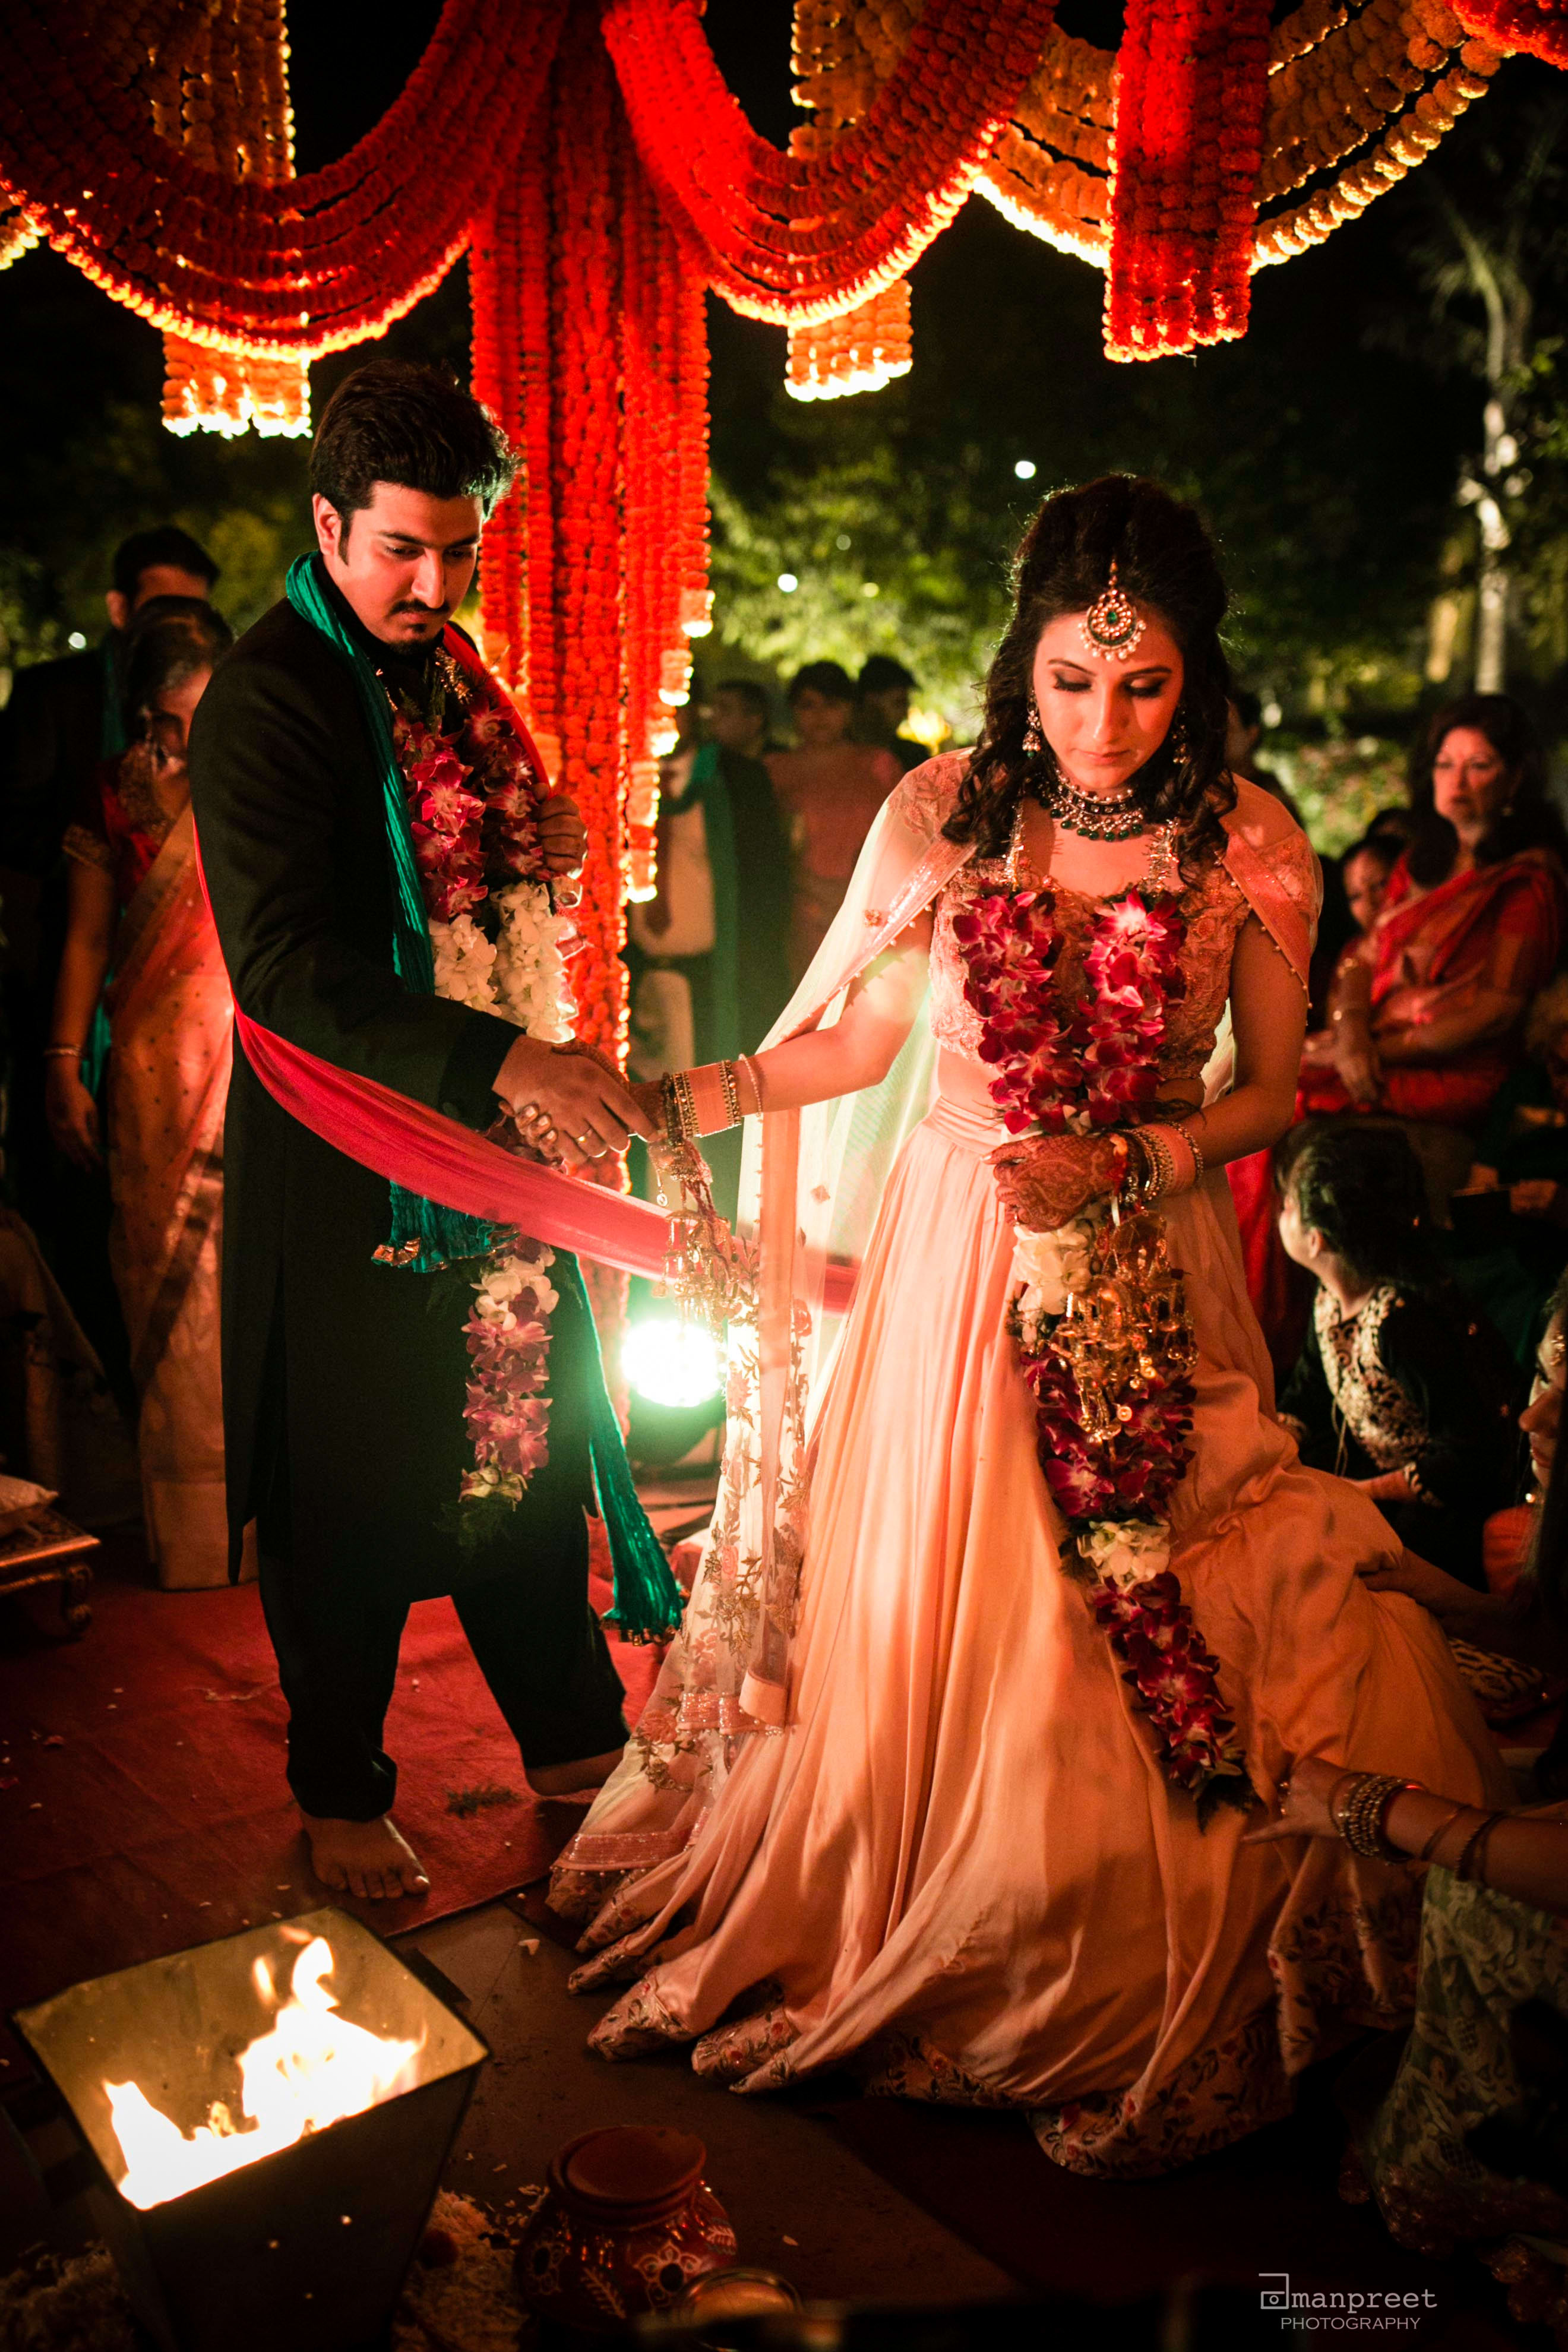 pranay & kriti!:geetanjali salon, raju mehandi wala, amanpreet photography, ole couture